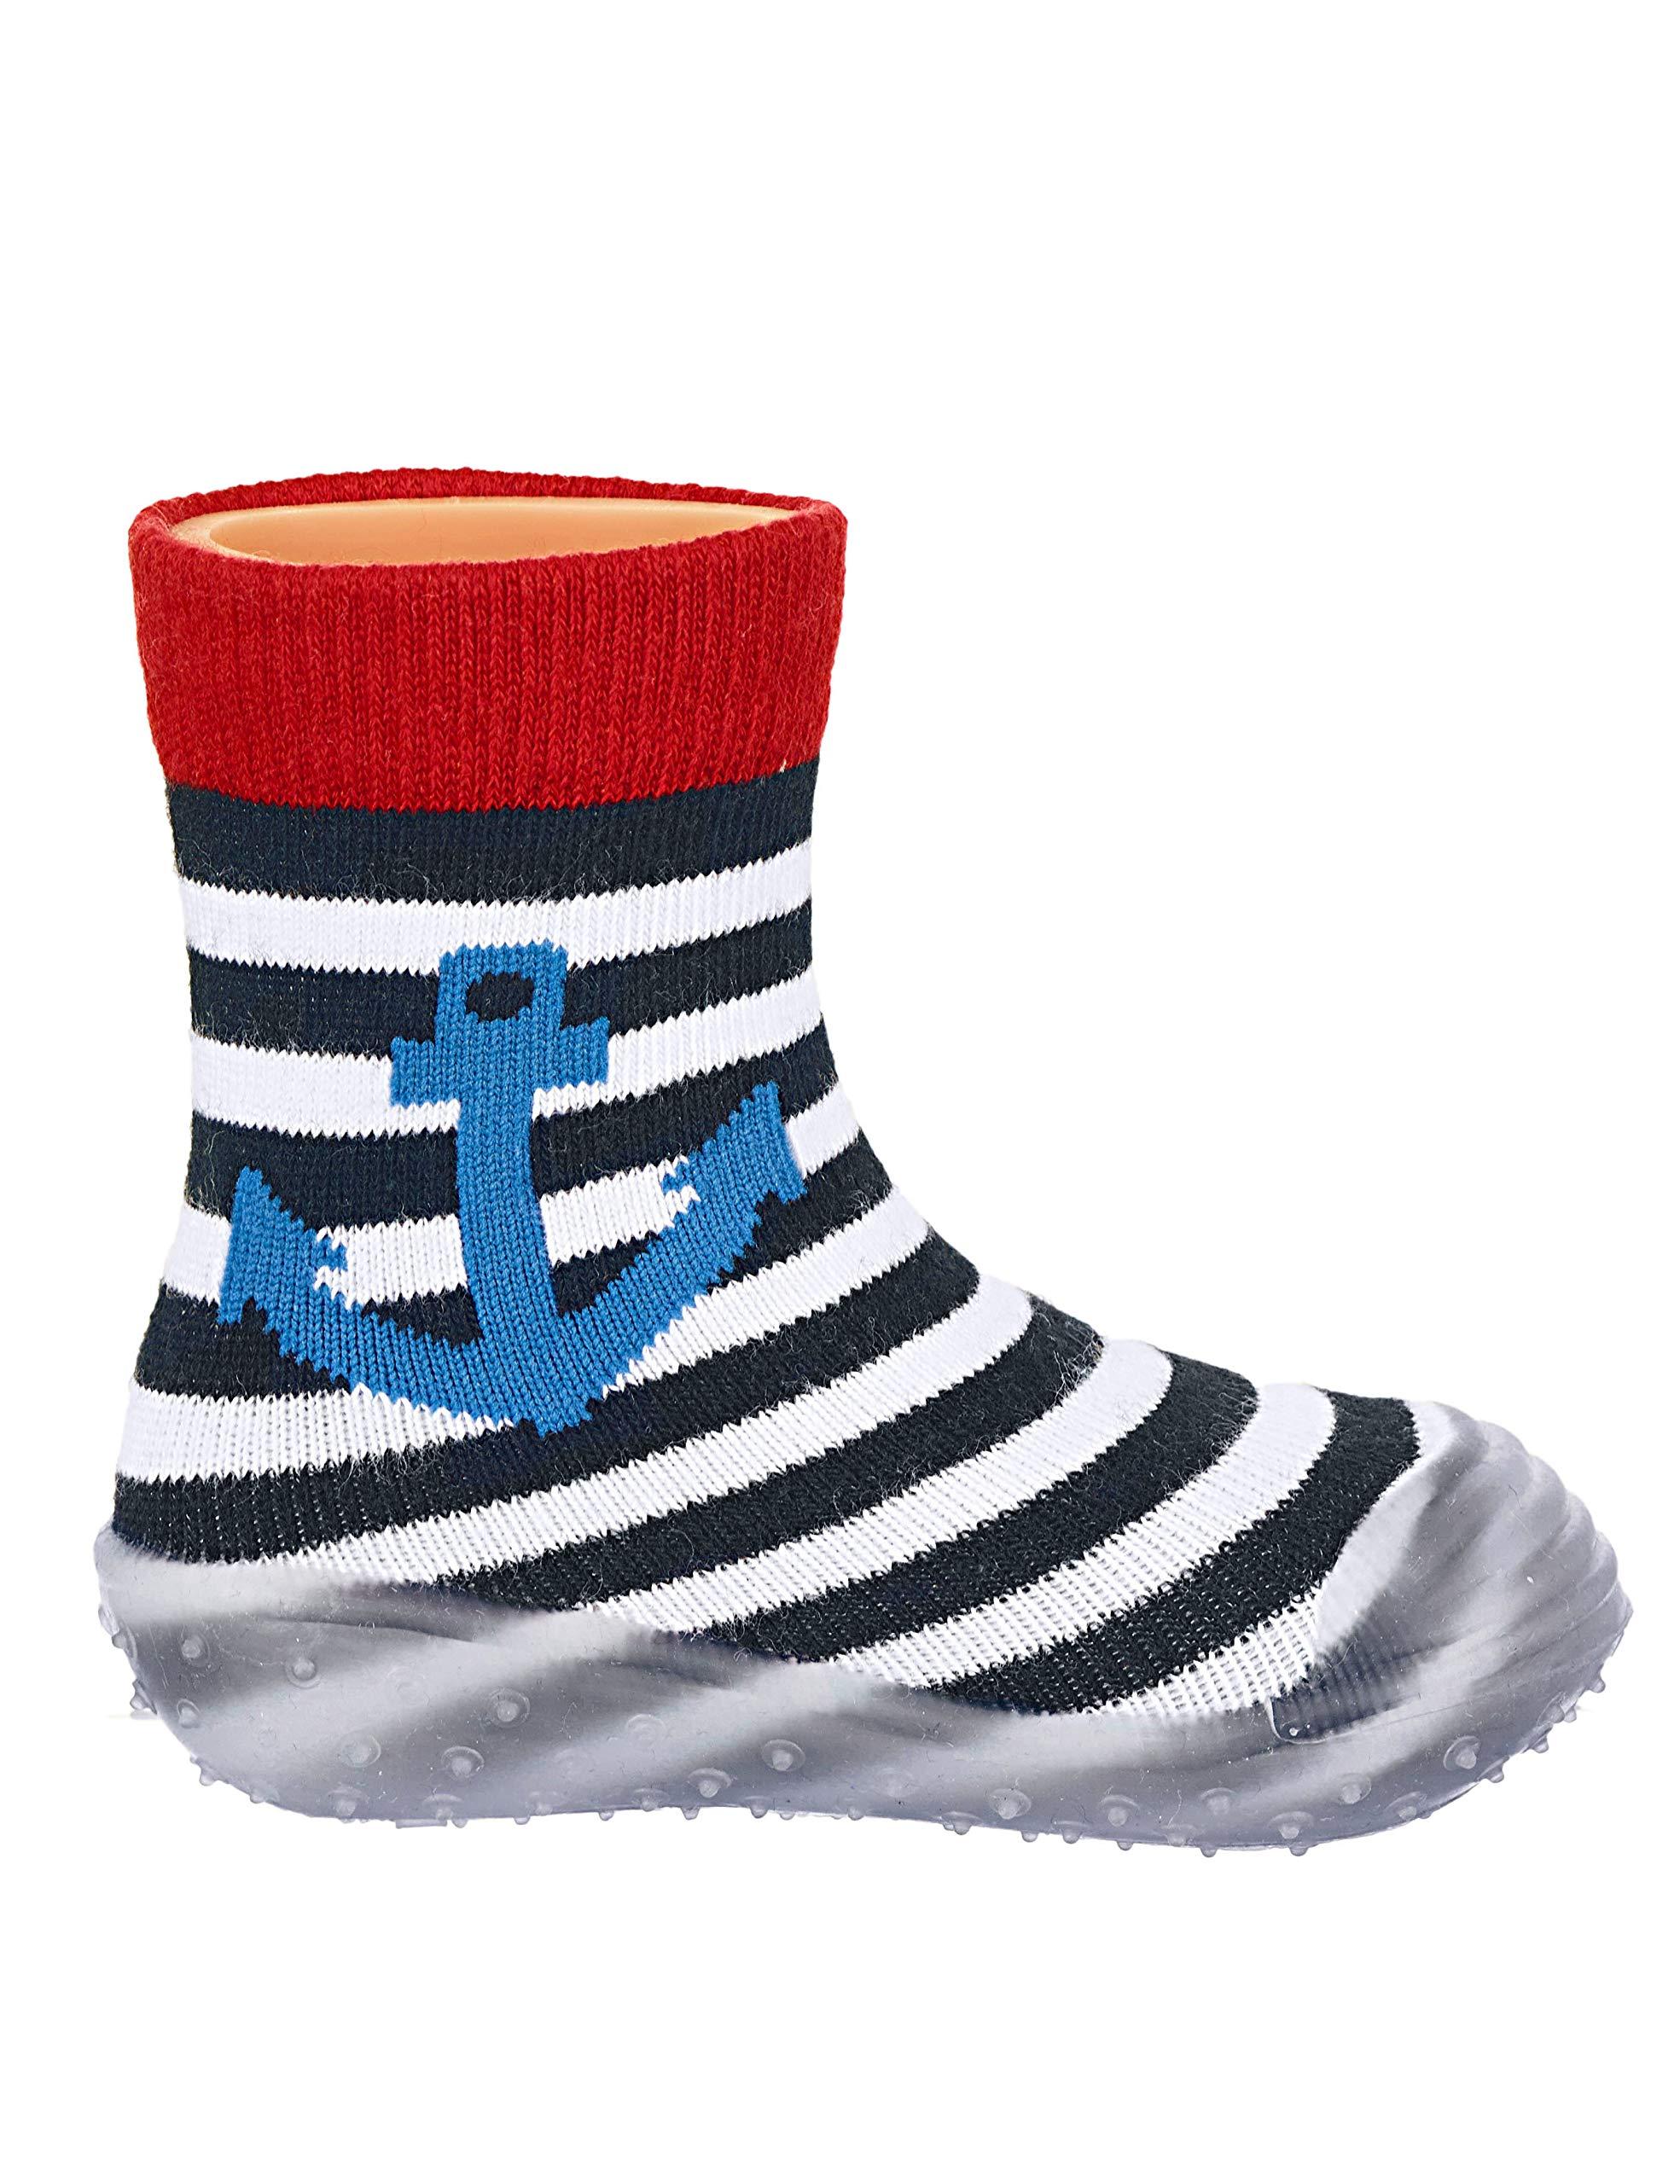 Sterntaler Adventure-Socks Anker, Zapatillas Impermeables para Niños 3